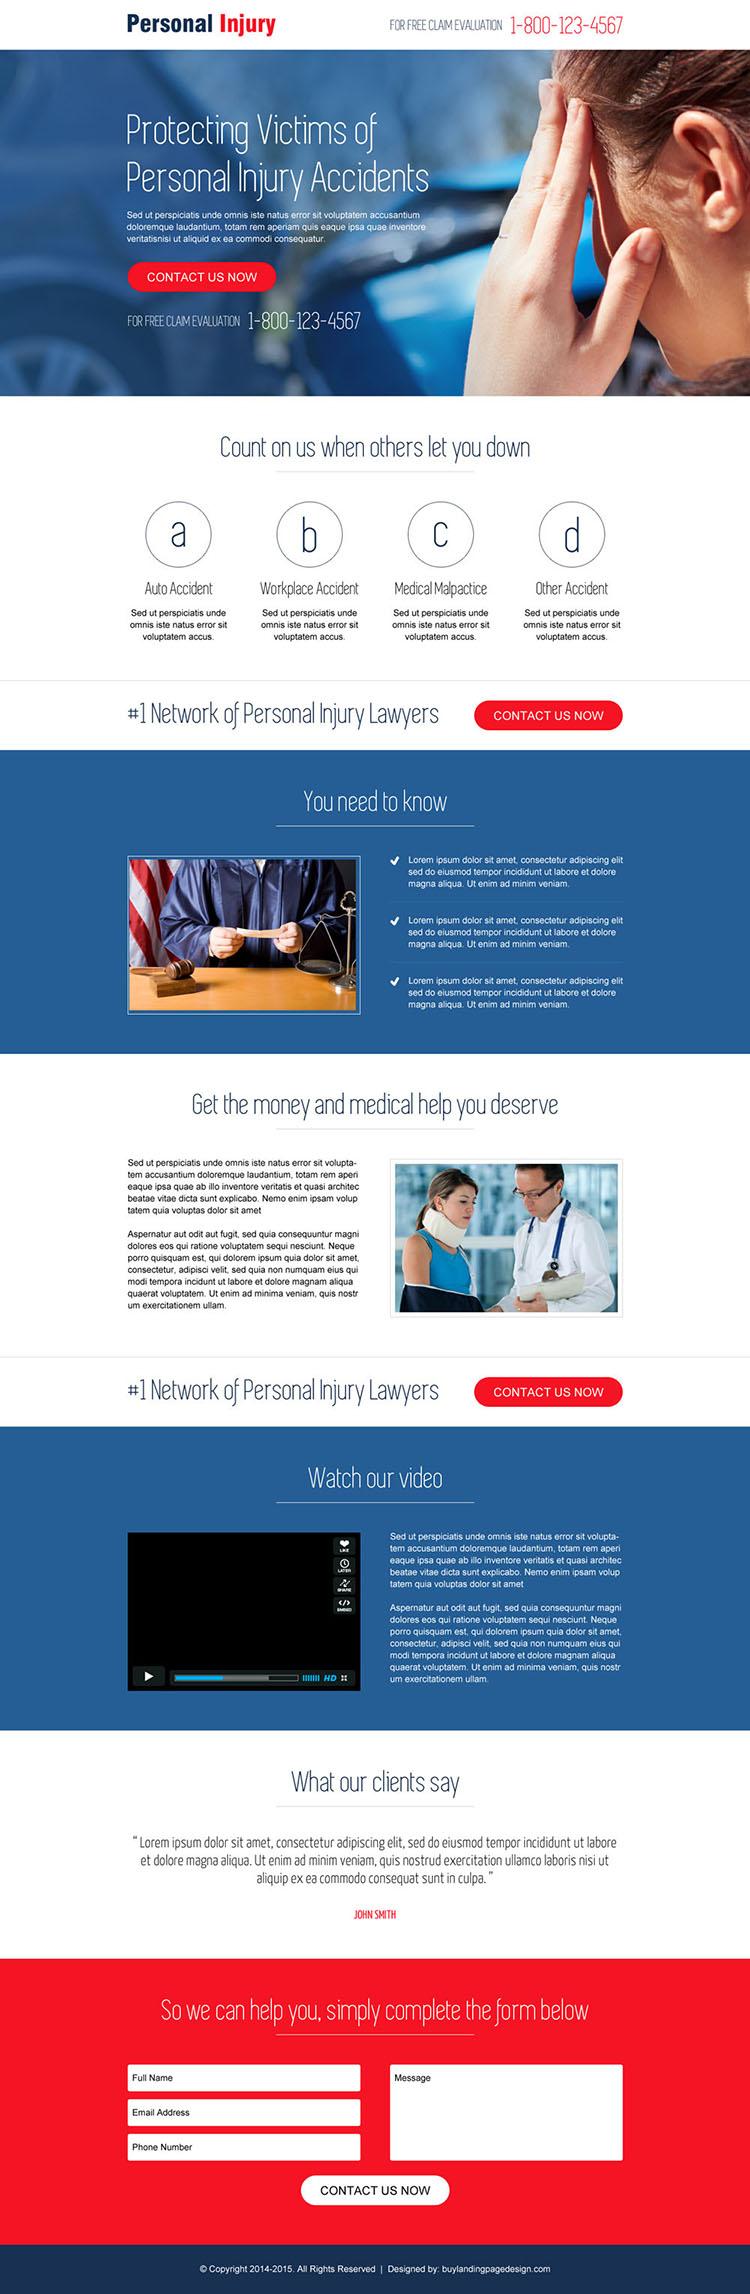 personal injury landing page design template